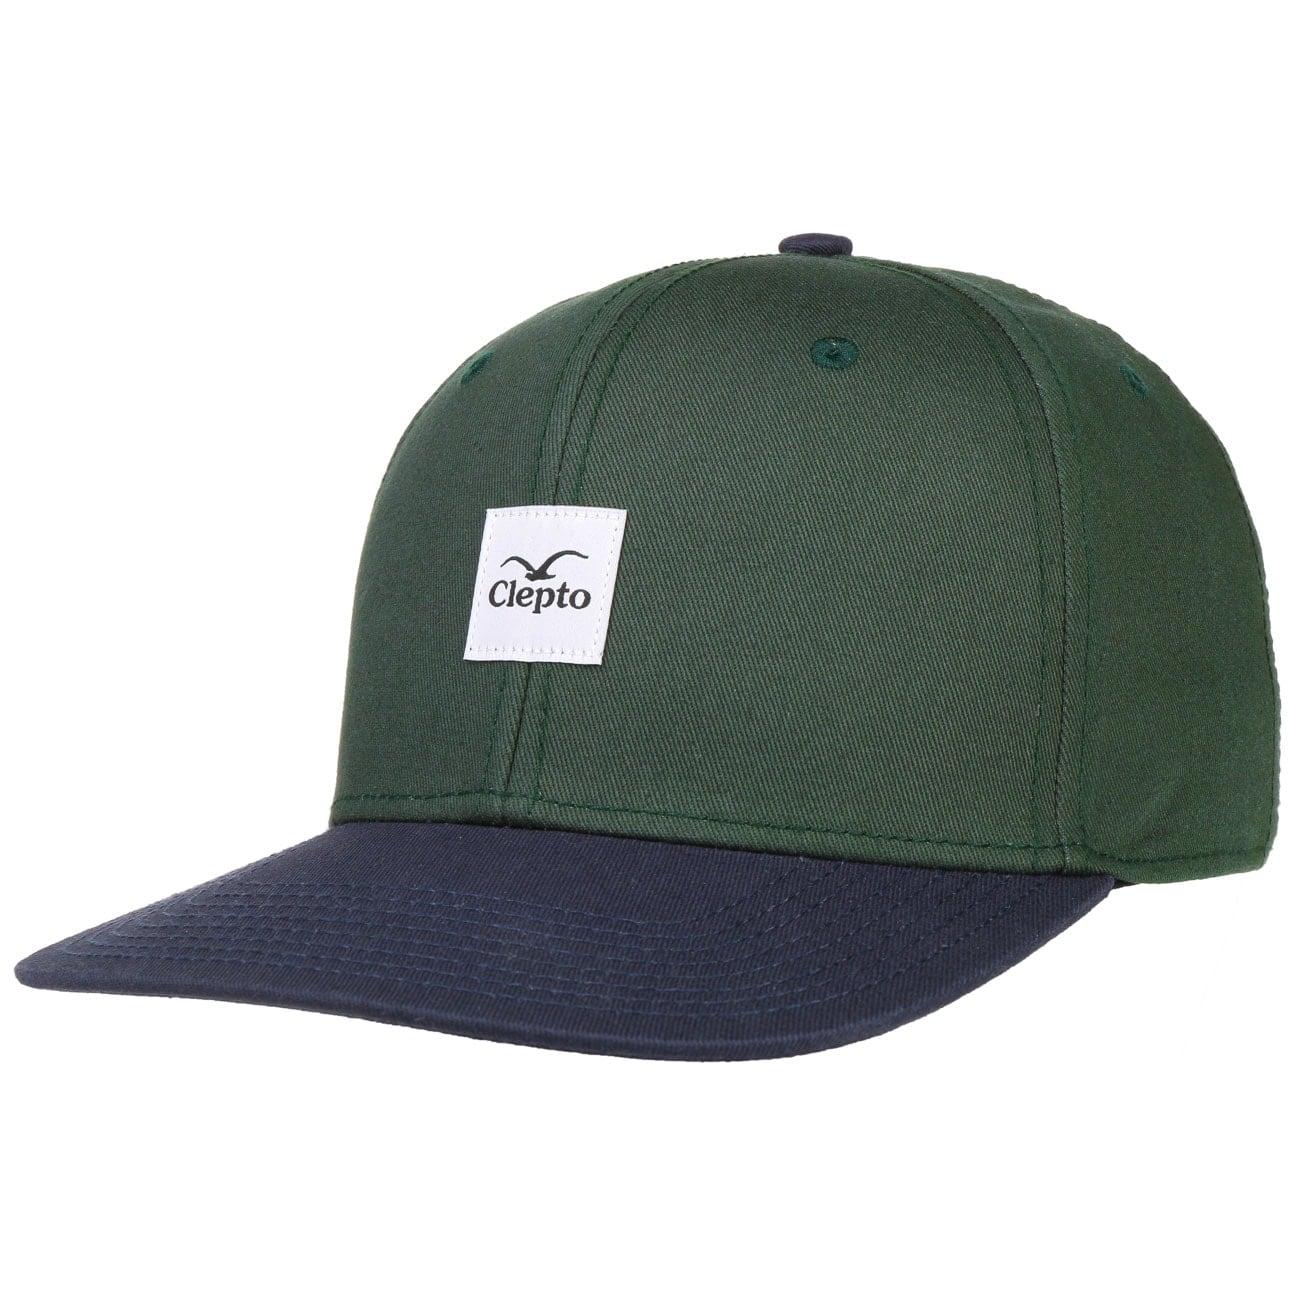 badger-3-snapback-cap-by-cleptomanicx-flat-brim-cap